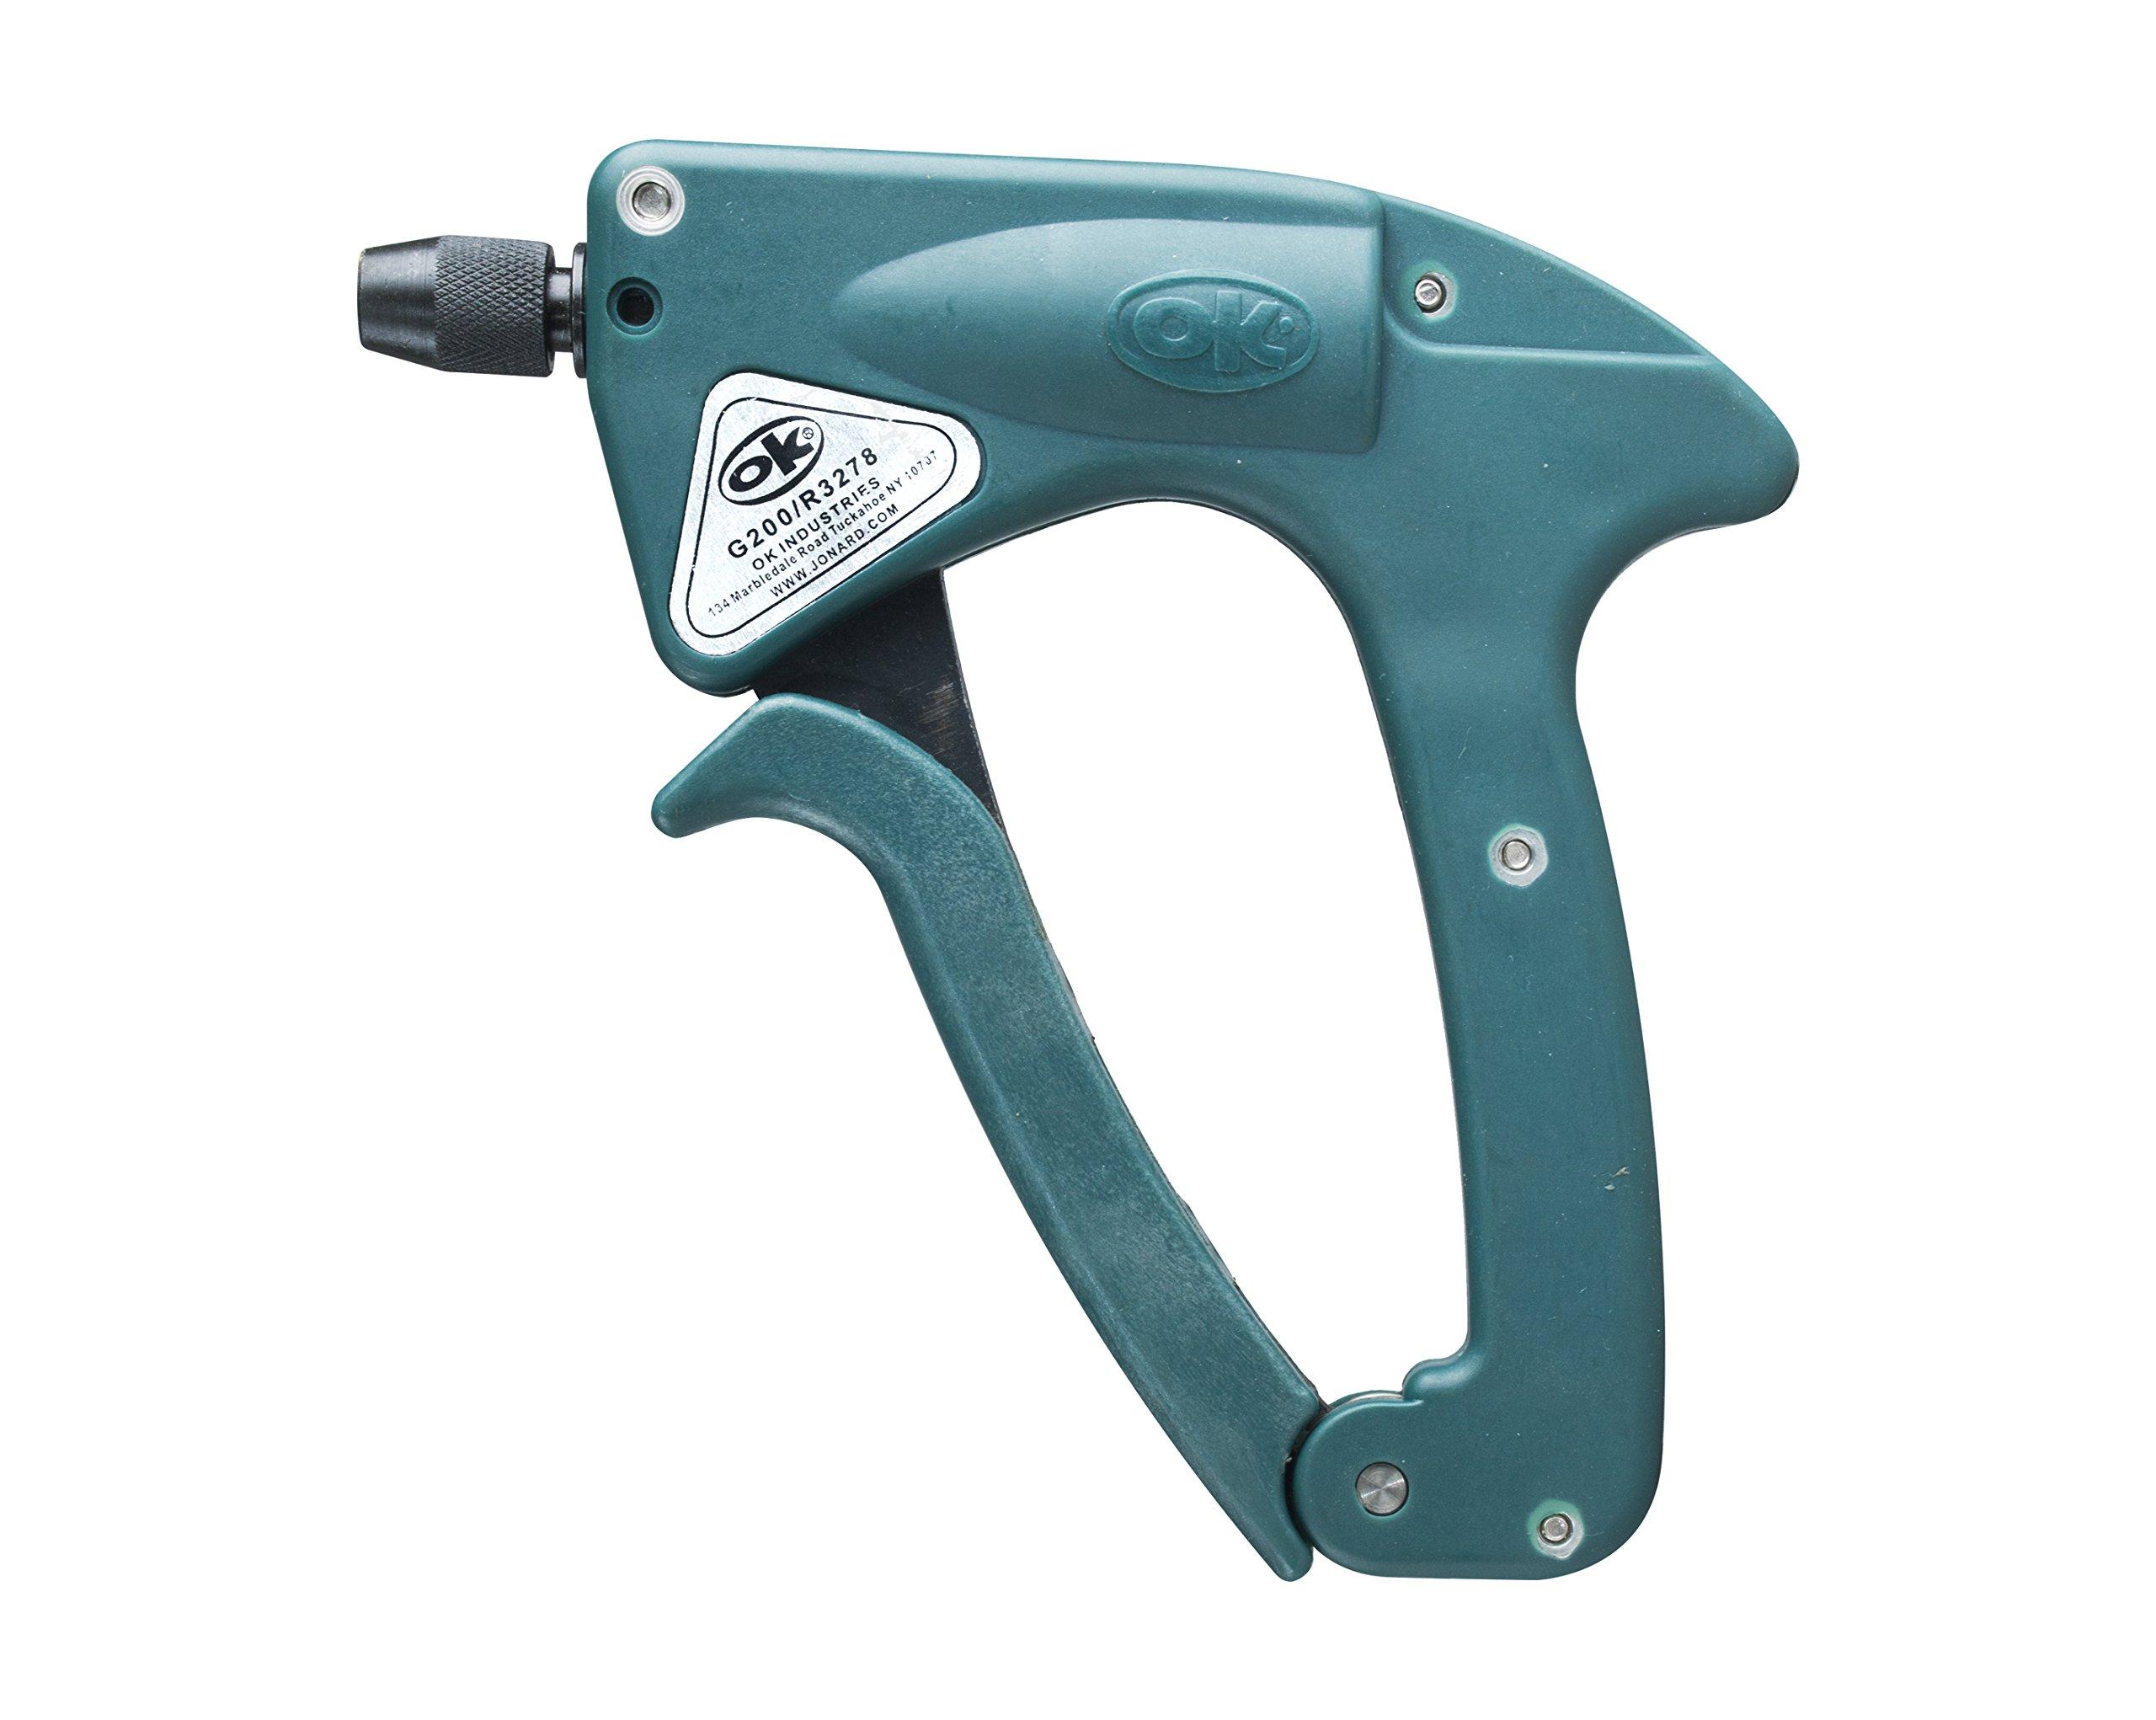 Jonard G200/R3278 Lexan Wire Wrapping Tool, 18 AWG (1.00mm) thru 32 AWG (0.20mm)